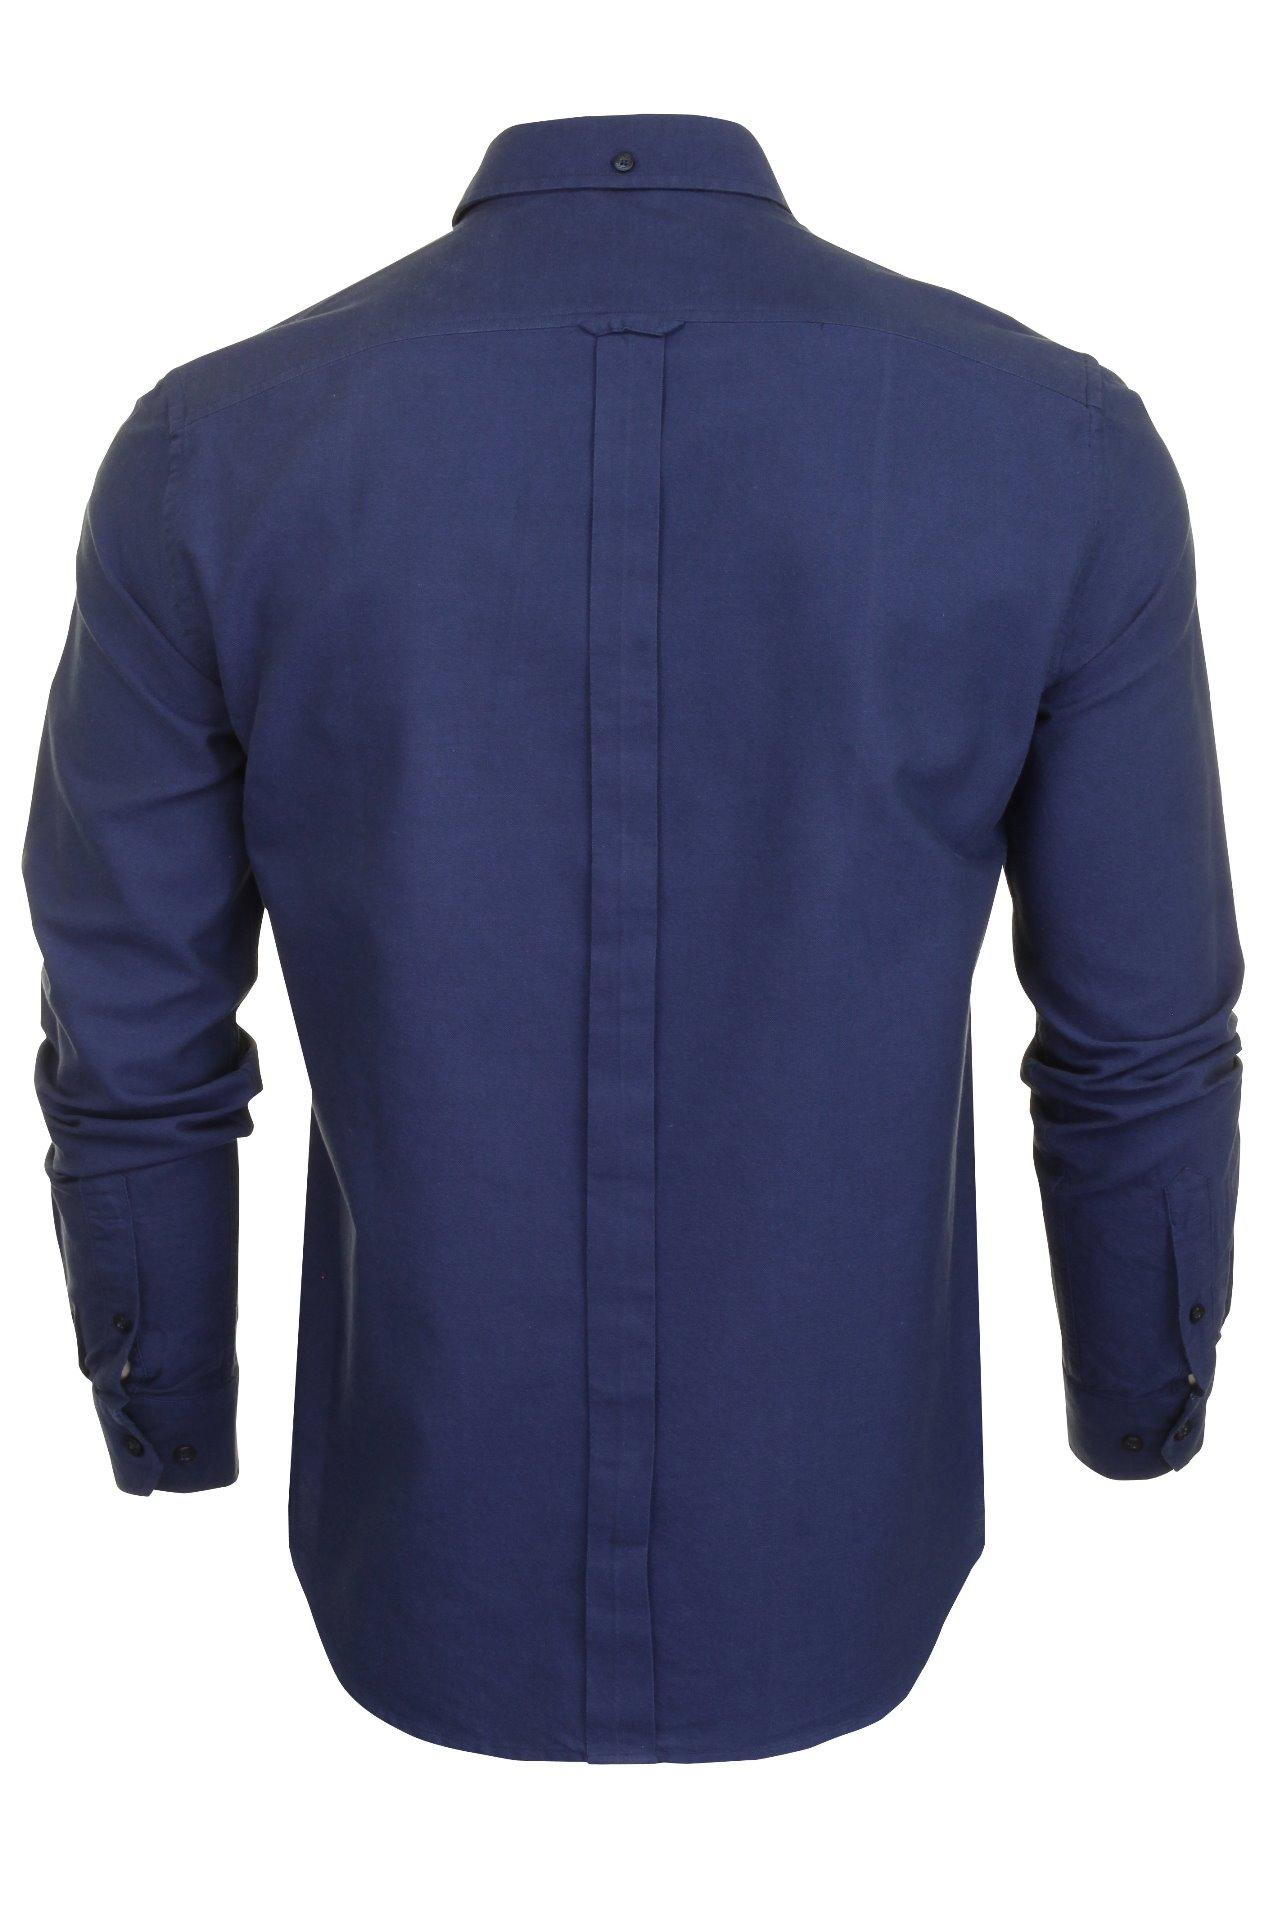 Ben-Sherman-Long-Sleeved-039-Oxford-039-Shirt thumbnail 11